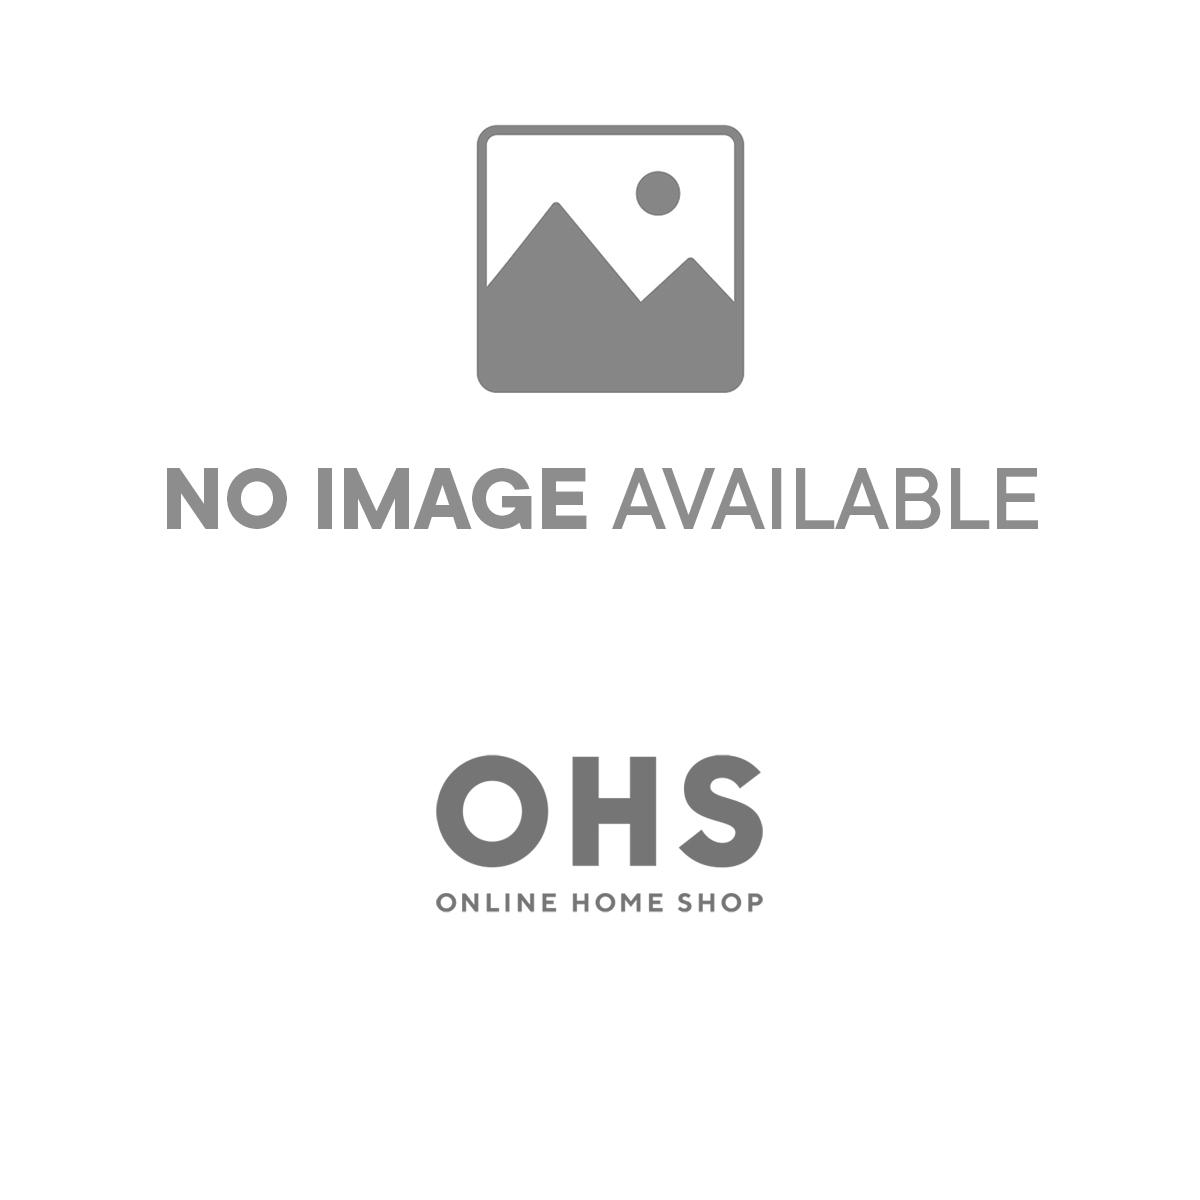 Dreamscene Asha Duvet Quilt Bedding Bed In A Bag Cushion Cover Runner - Black - Single